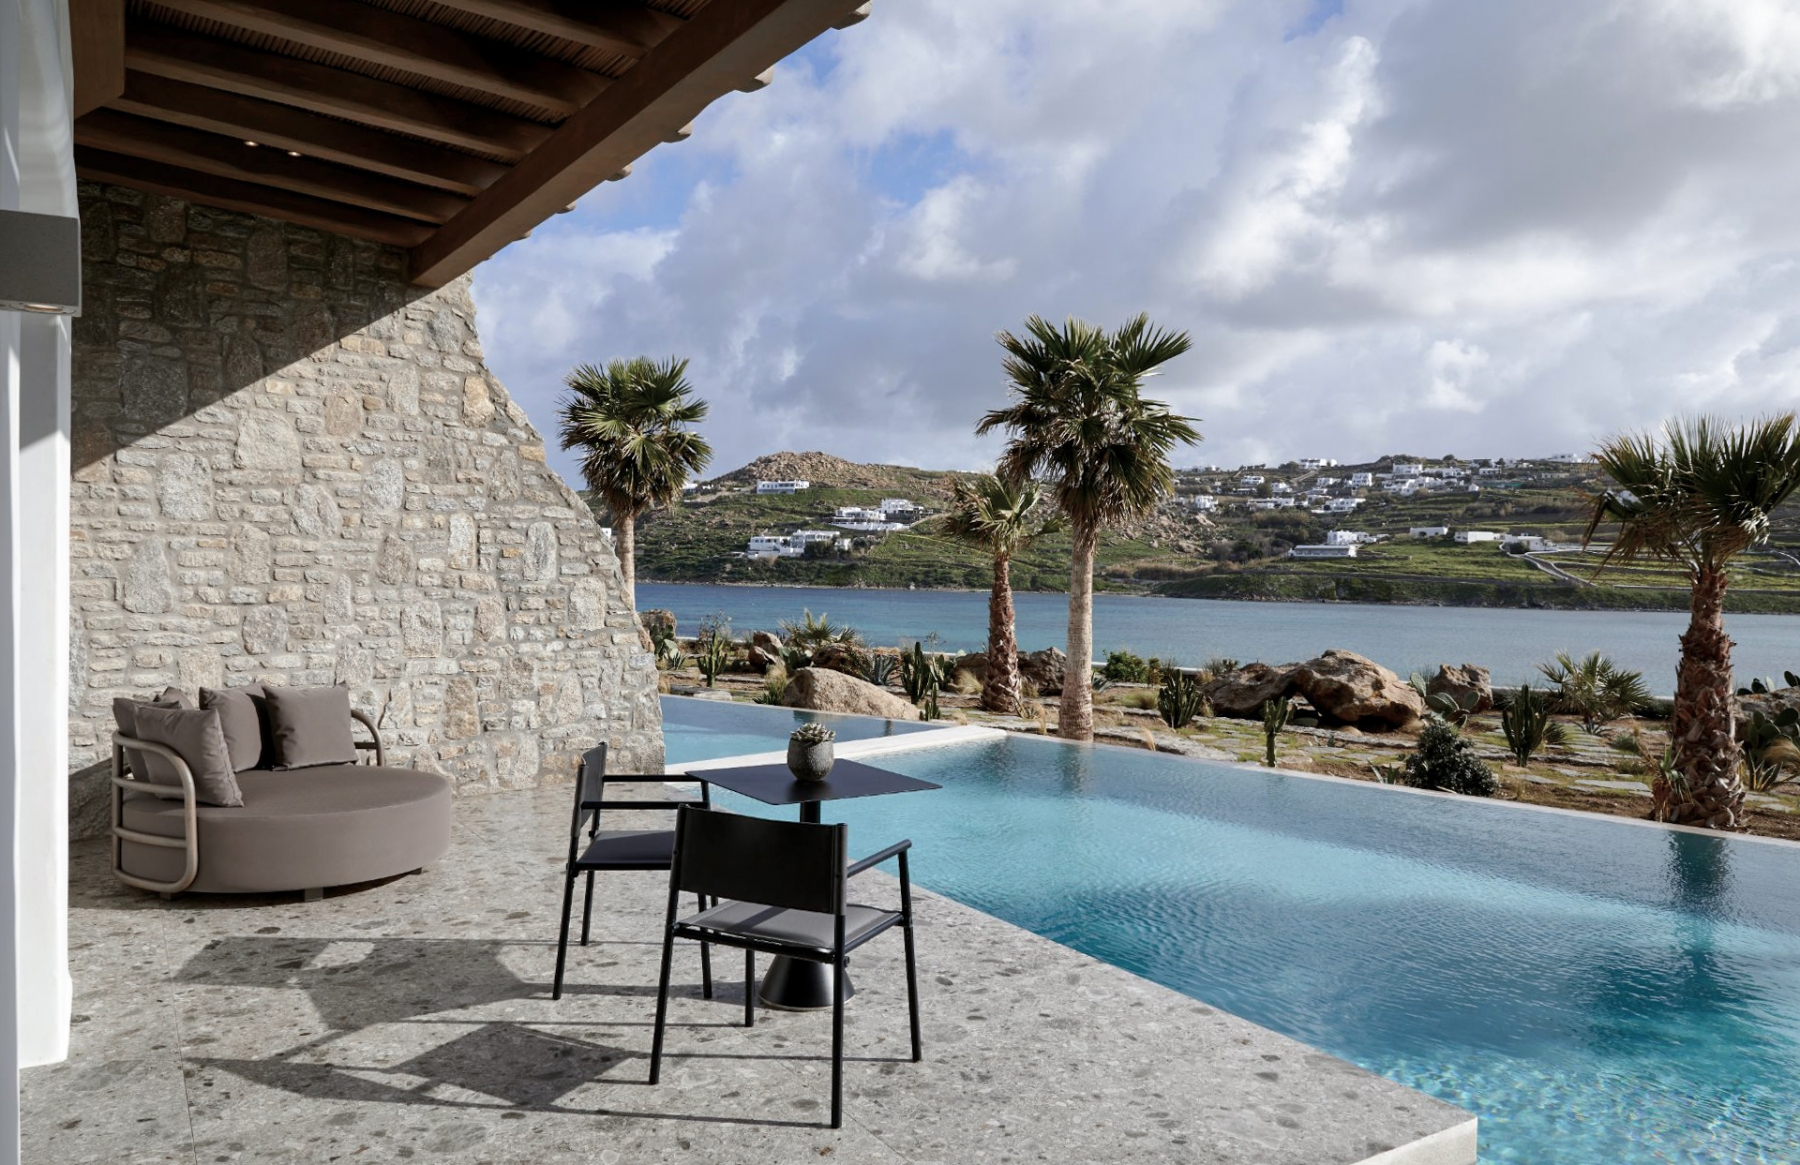 1_20_Aeonic-Suites-Spa-Luxury-Hotel-Mykonos-100